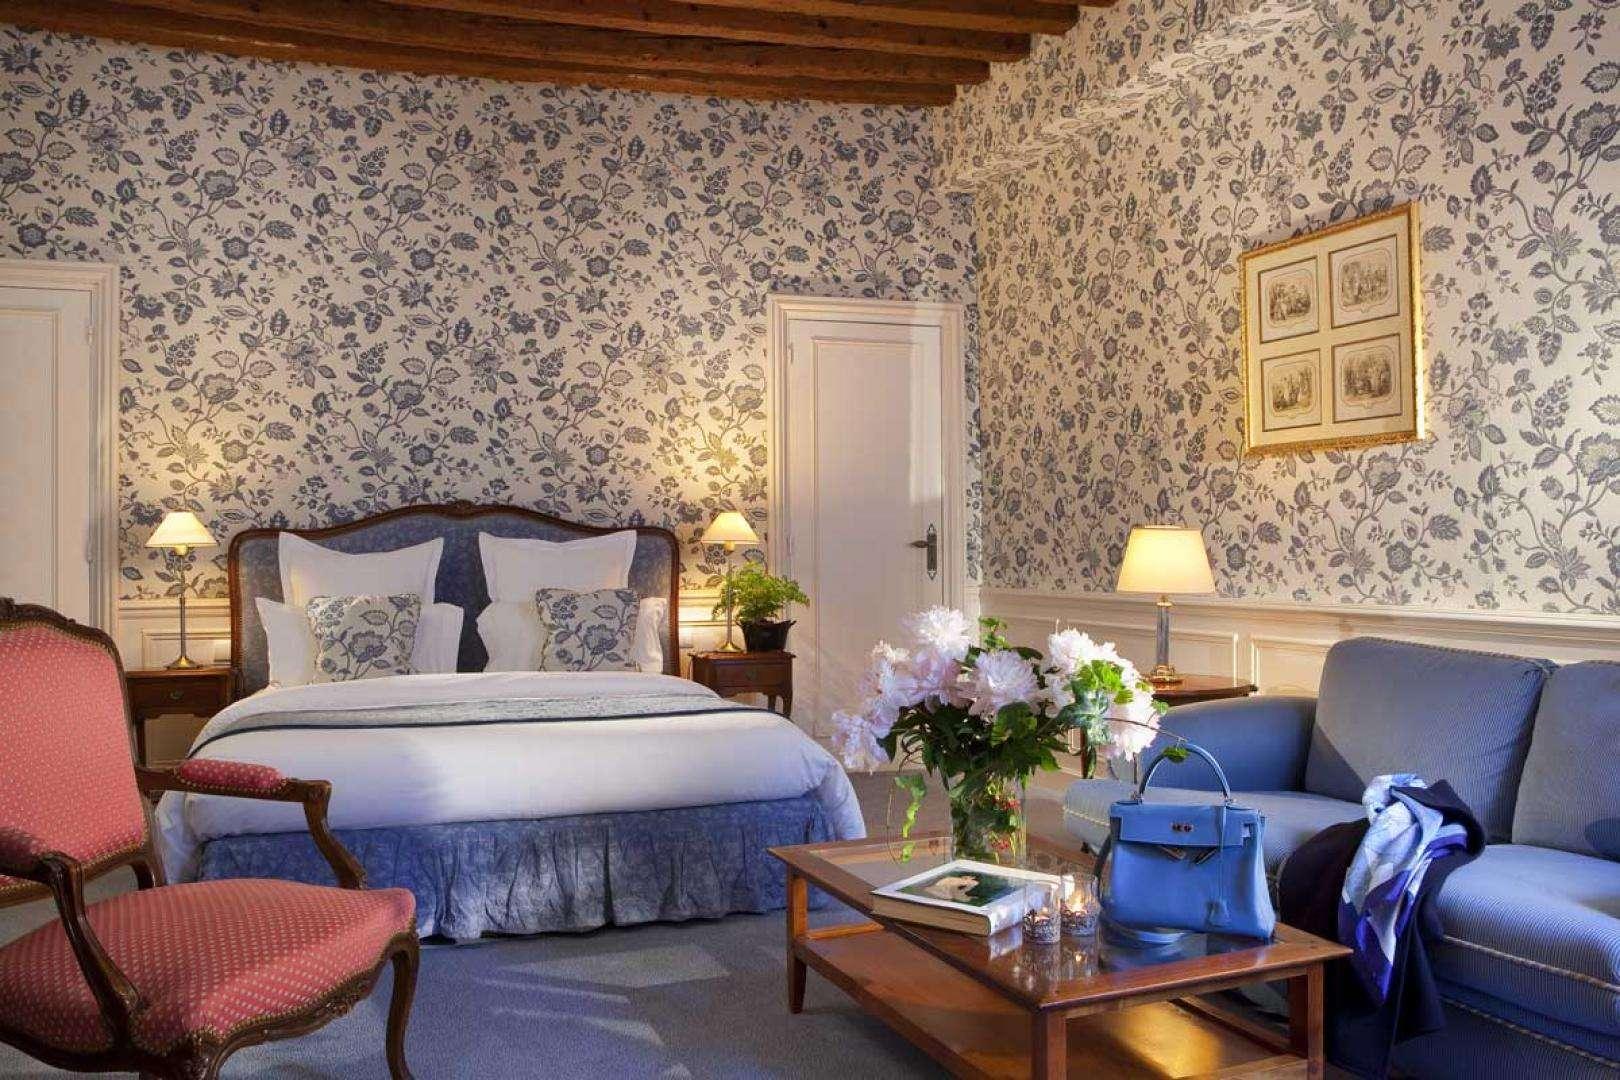 Hotel d\'Angleterre - Rooms and Suites - Paris Saint-Germain ...